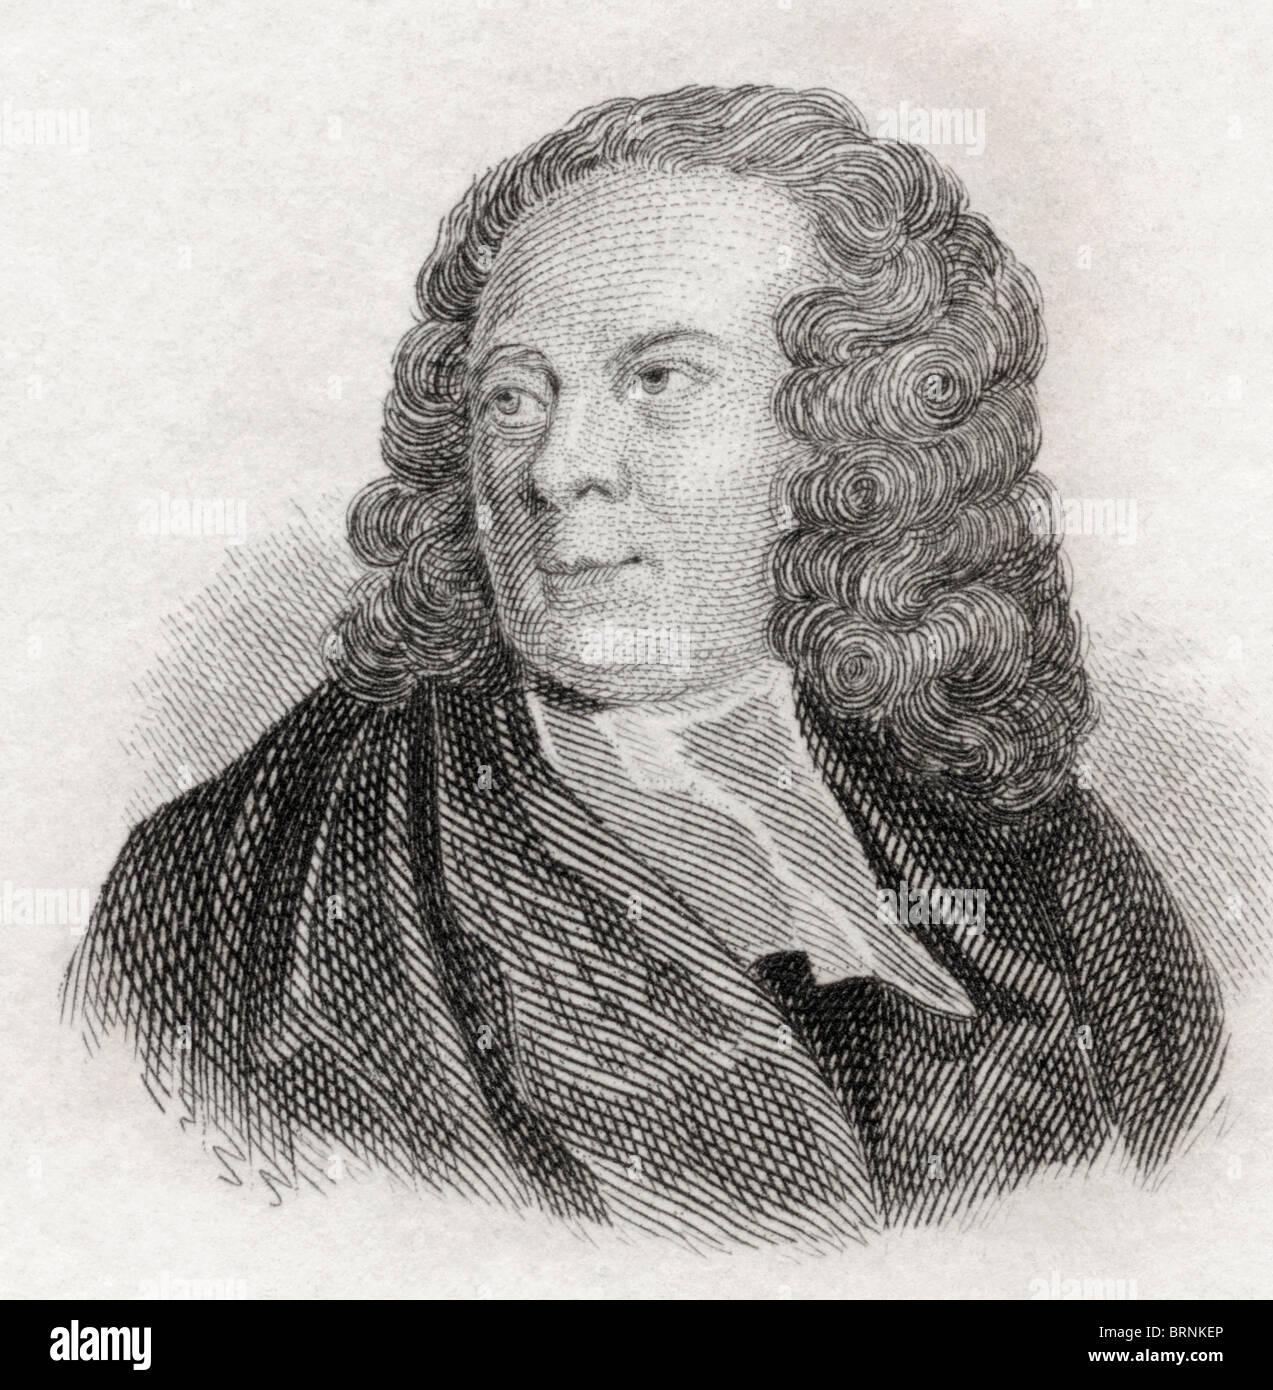 Edward Young, 1681 to 1765. English poet. - Stock Image